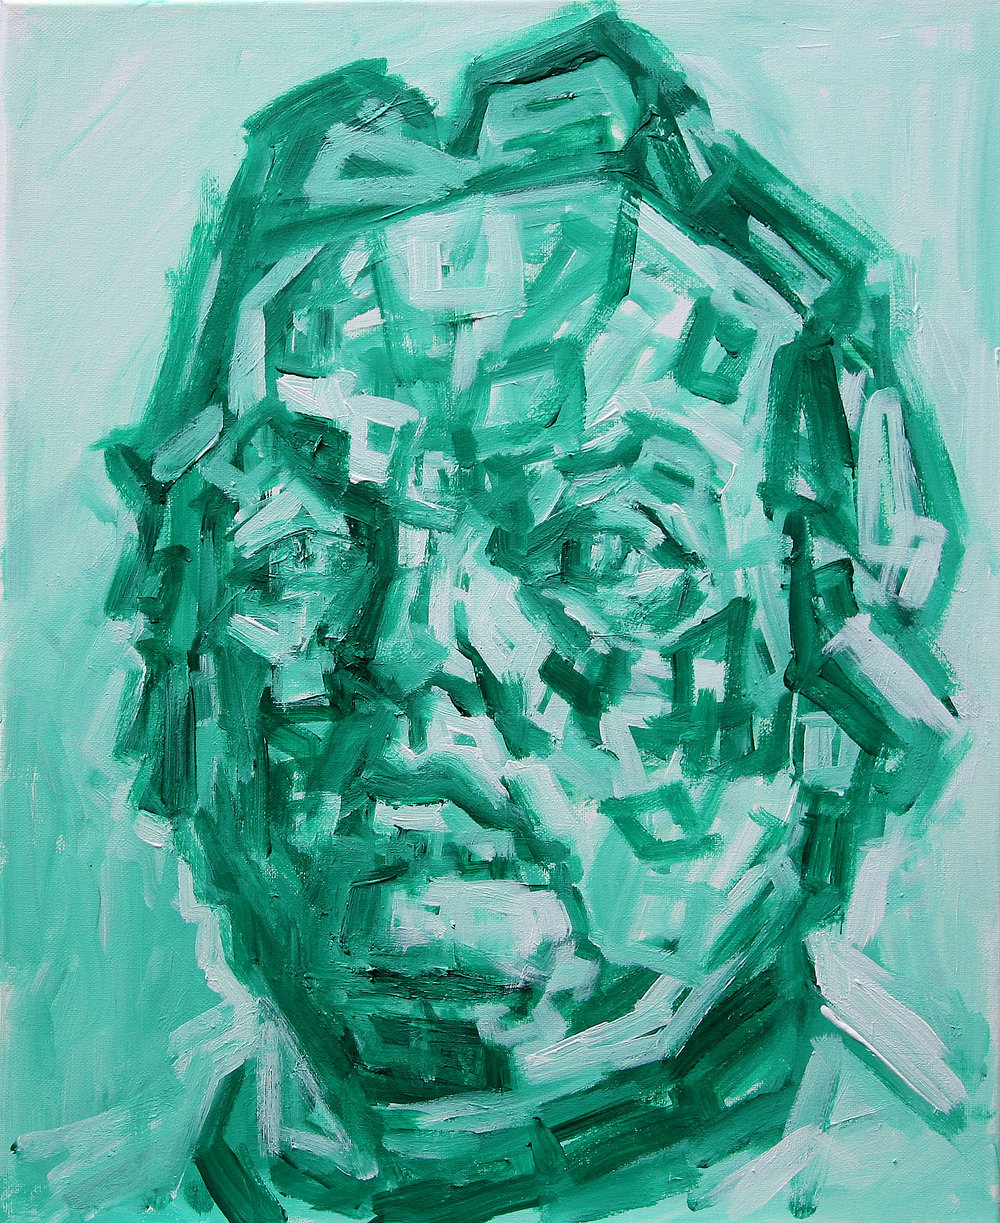 Emerald Self Portrait   acrylic on canvas  40 by 50 by 1.75 cm  unframed  £700